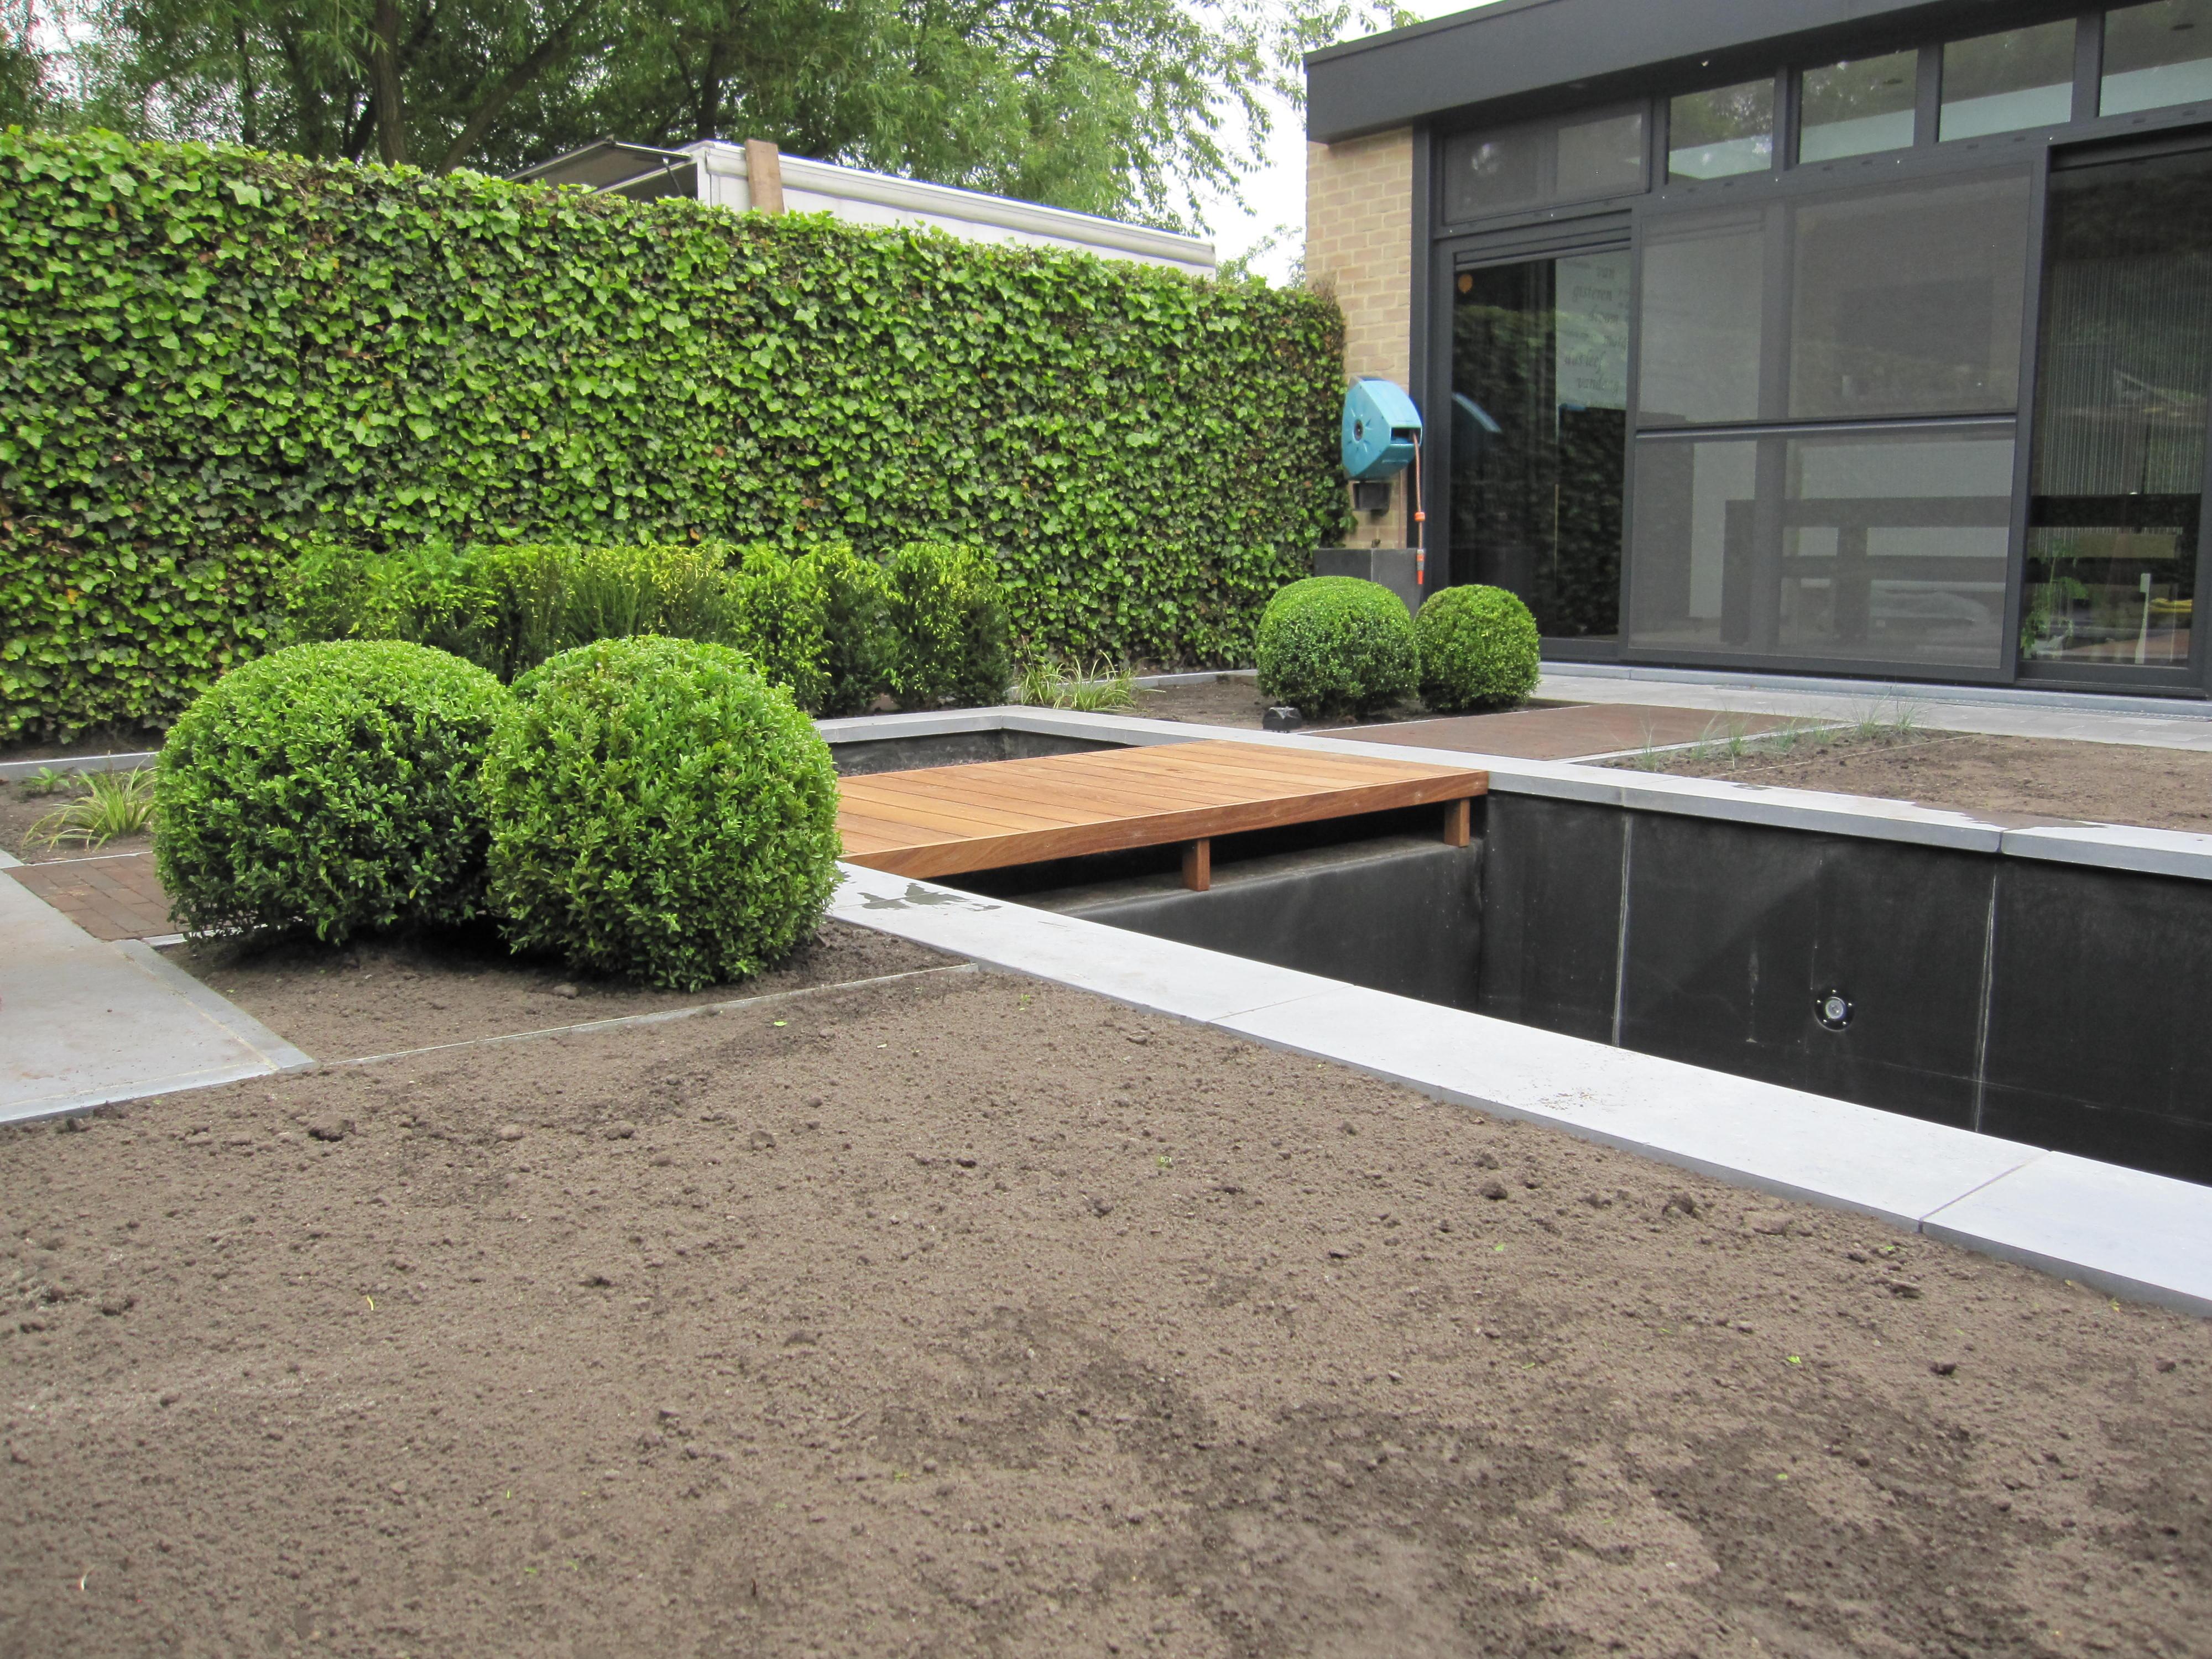 strakke achtertuin met vijver